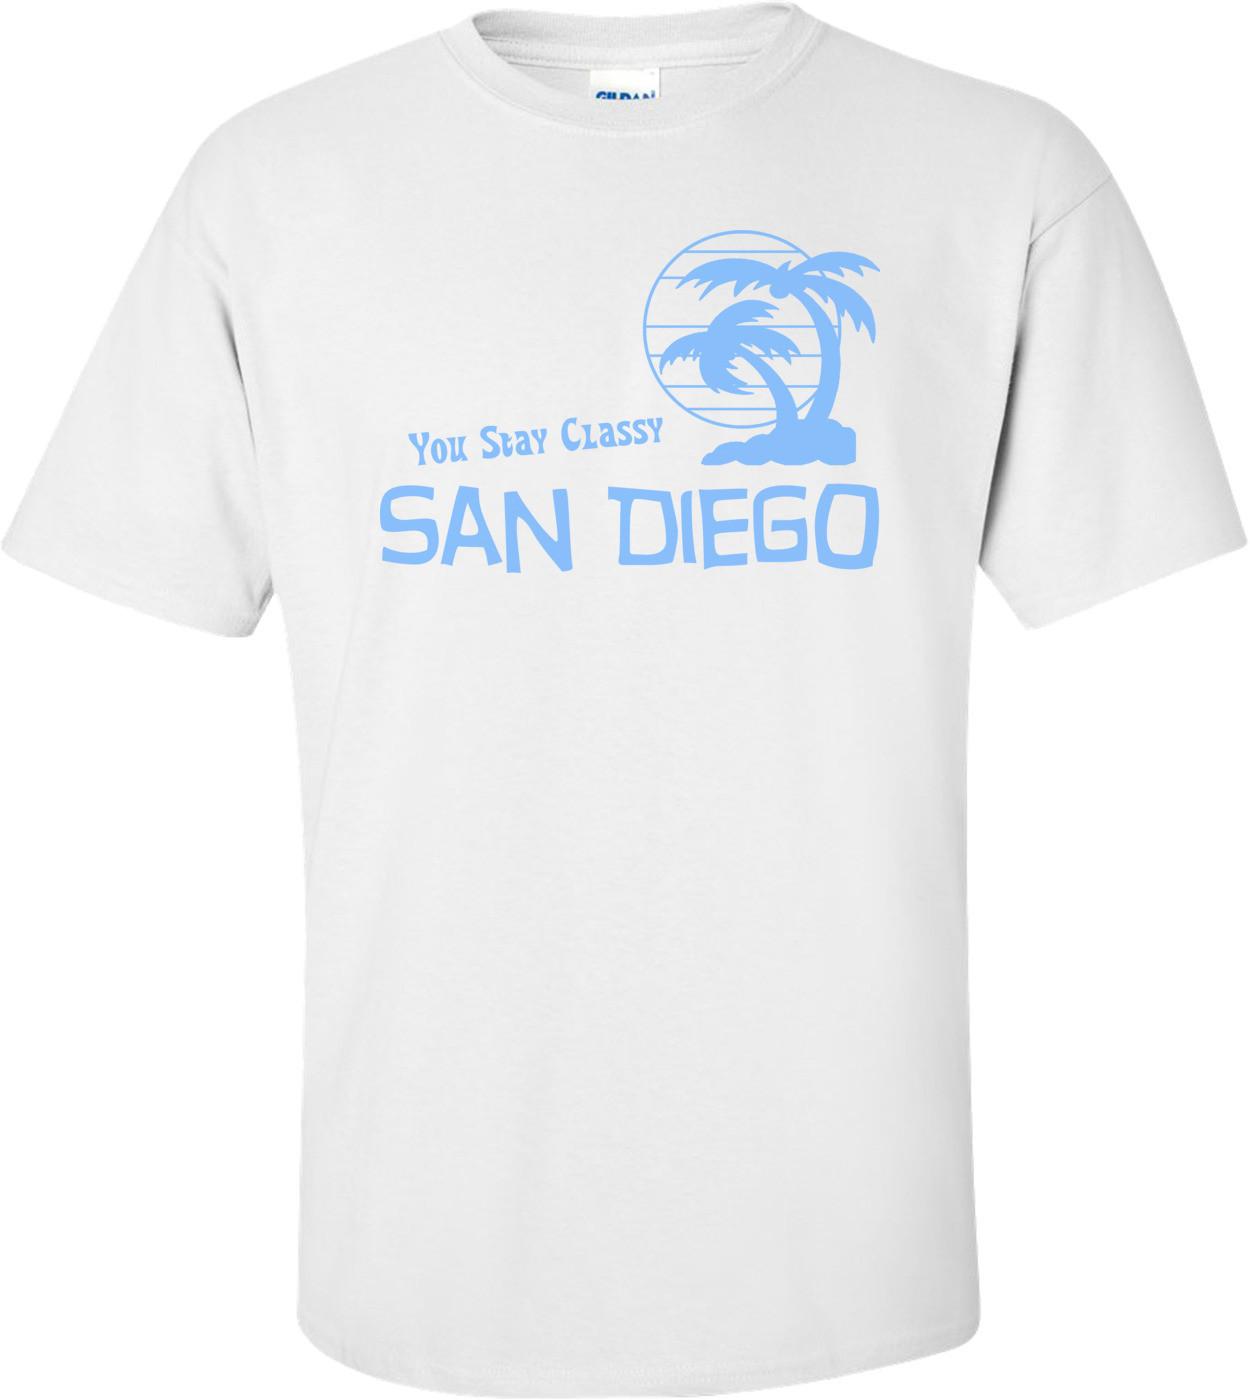 You Stay Classy San Diego - Anchorman